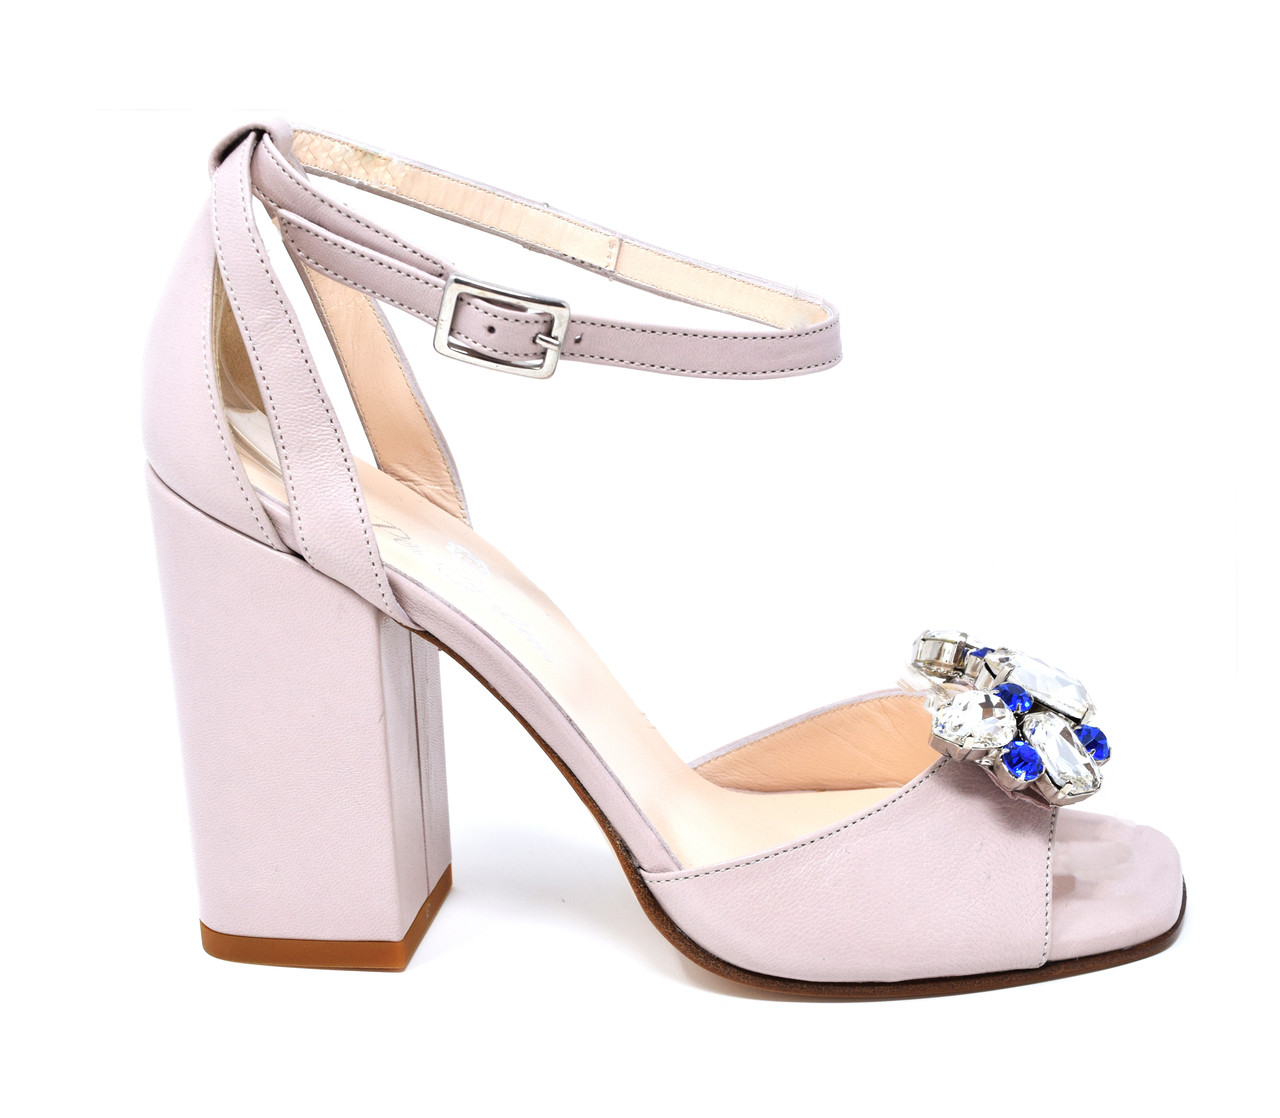 66eb94c4765a Sofia - Leather Block Heeled Sandals